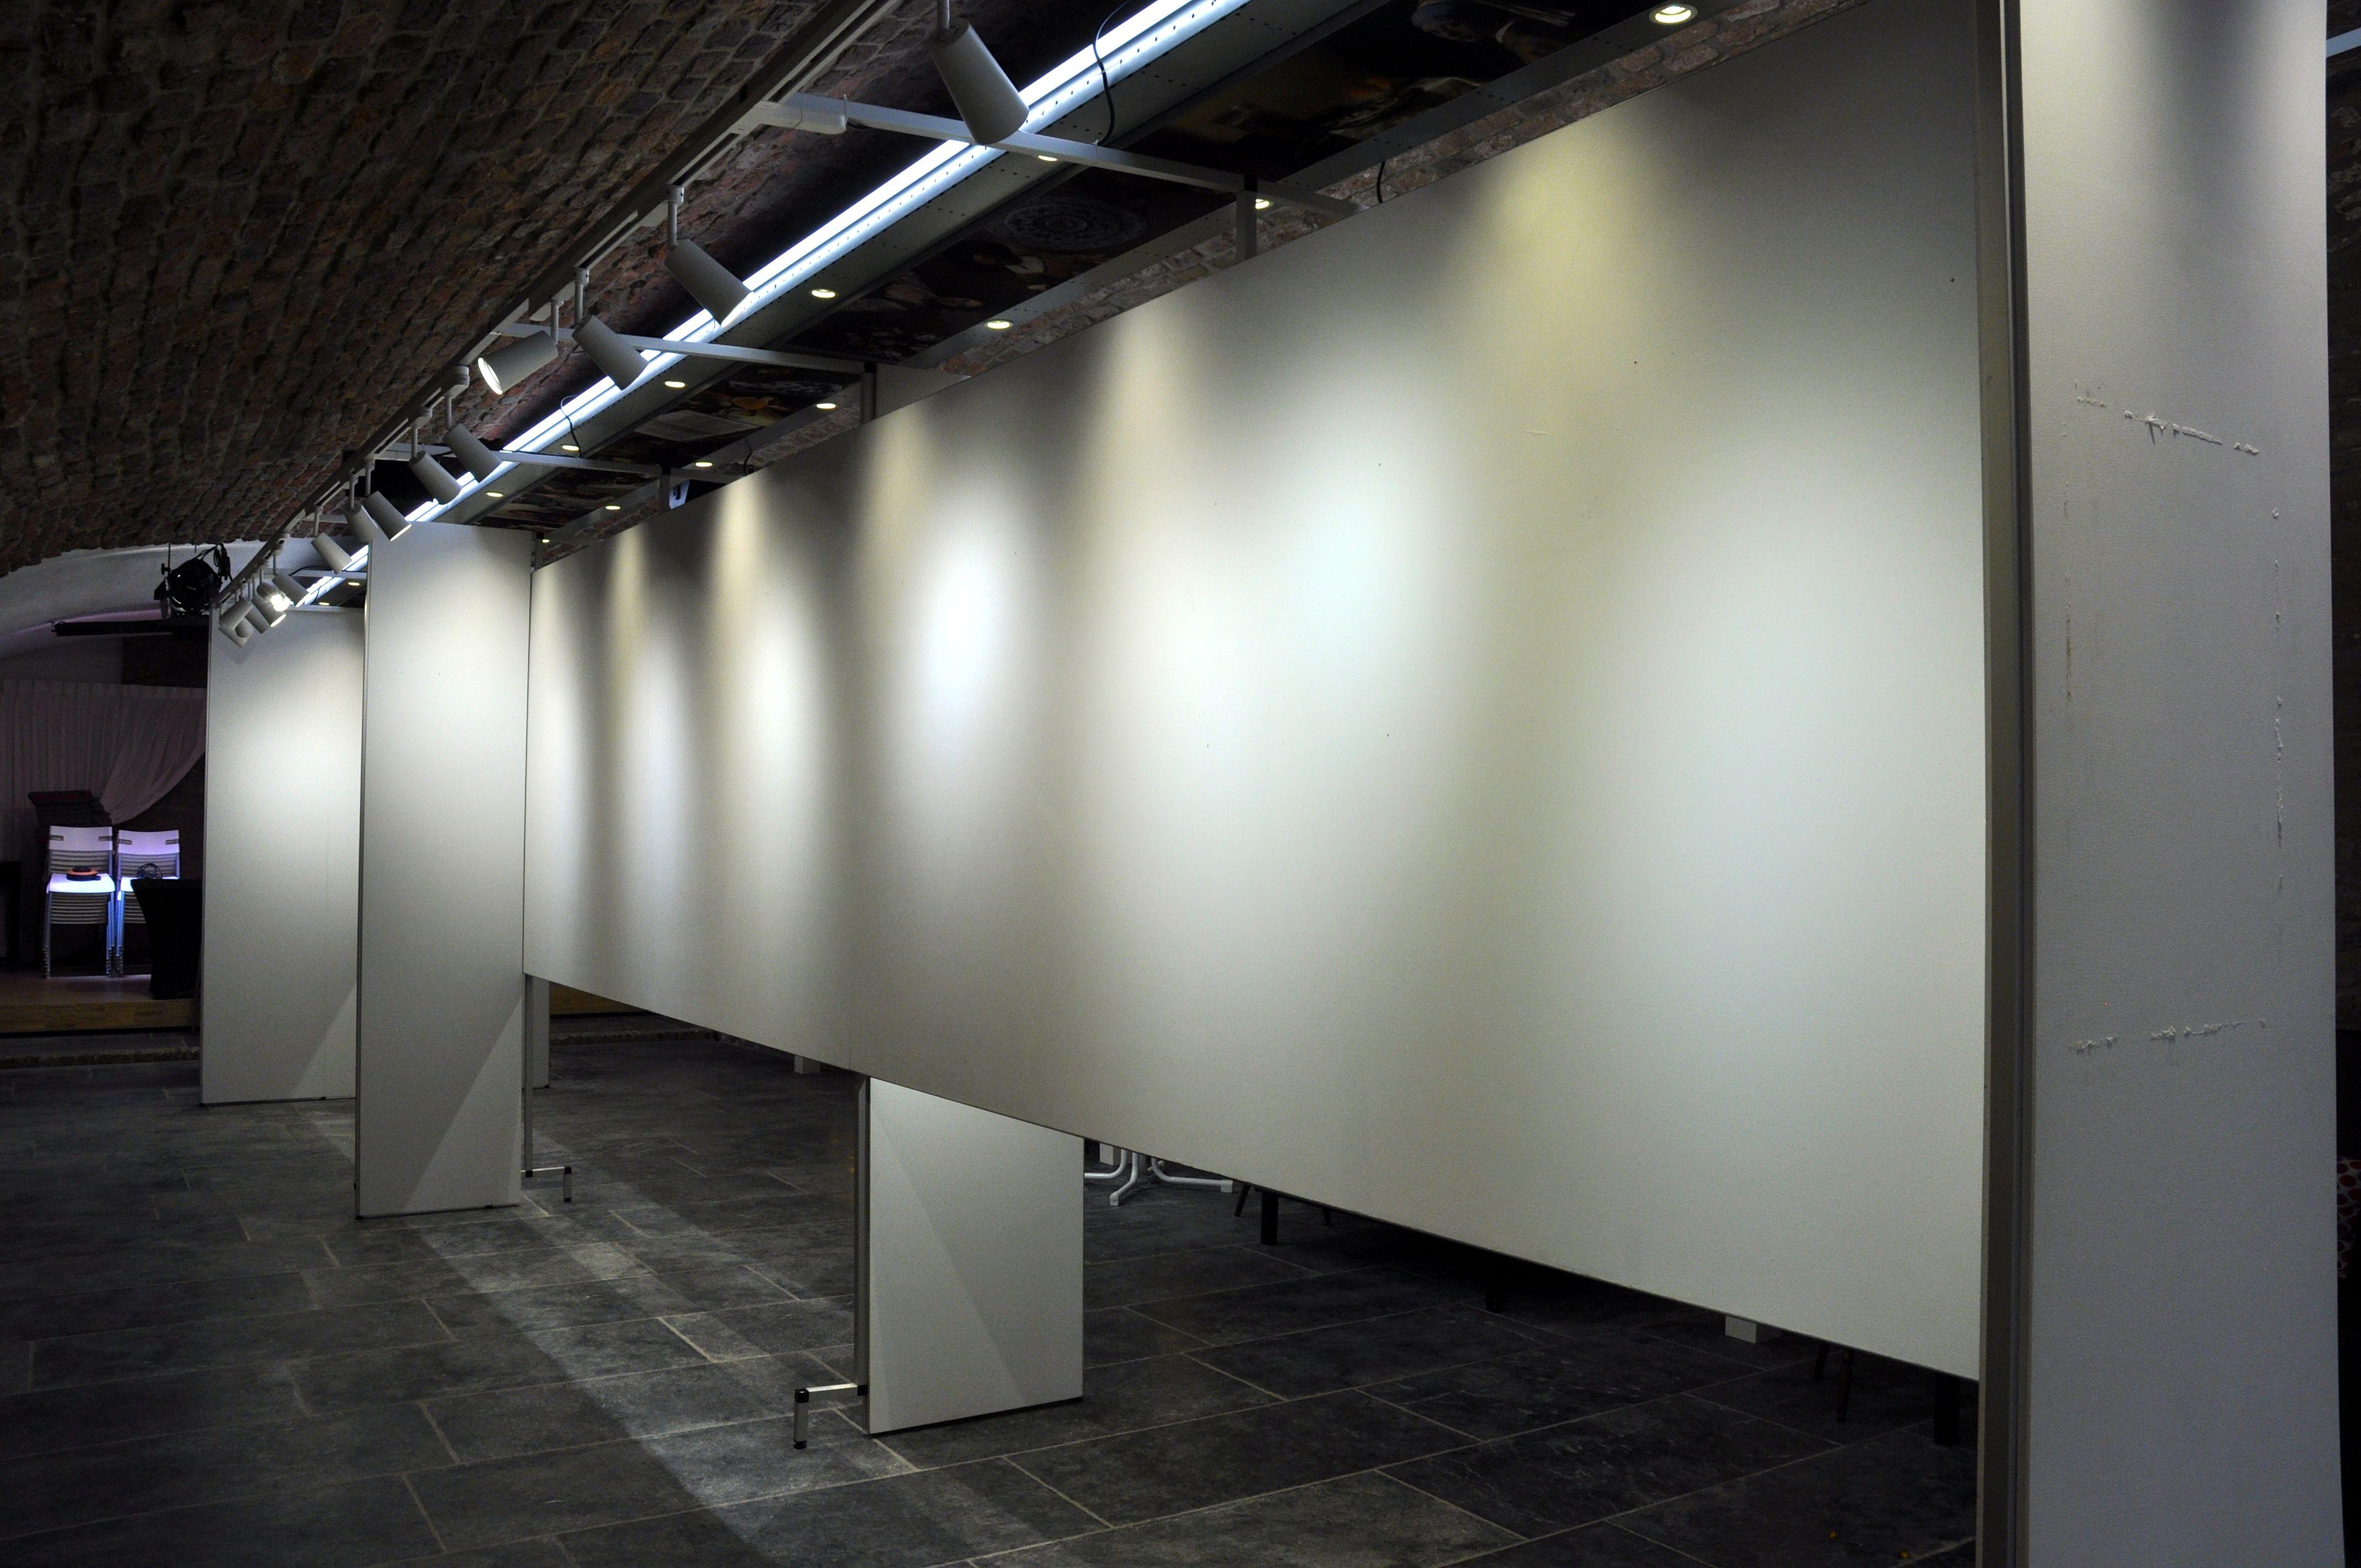 Witte Lely expositiewand 2.jpg